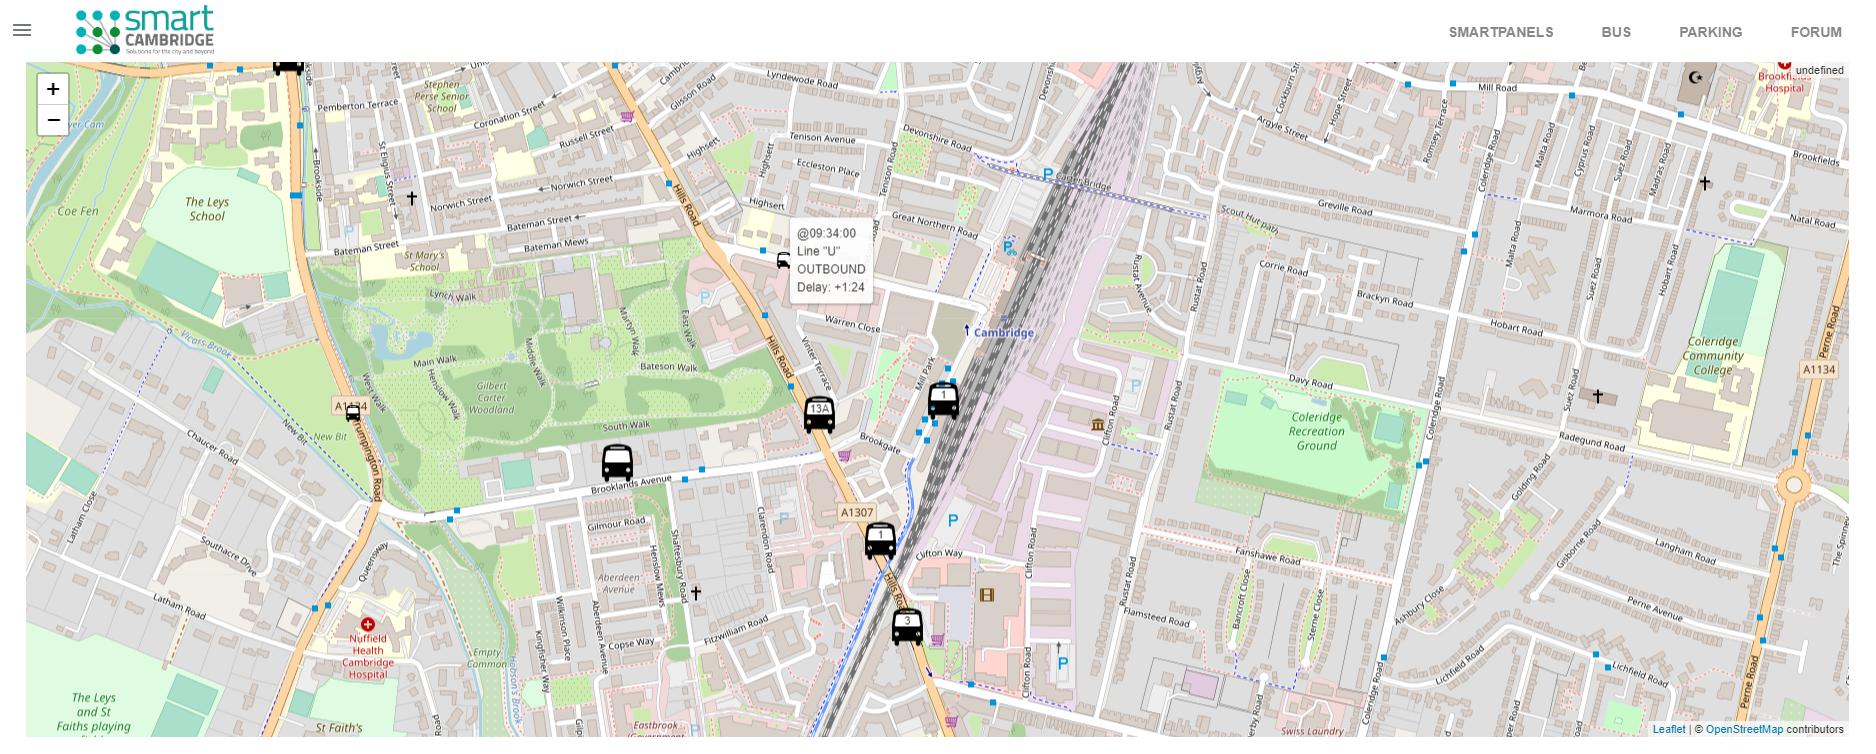 Smart Cambridge bus map